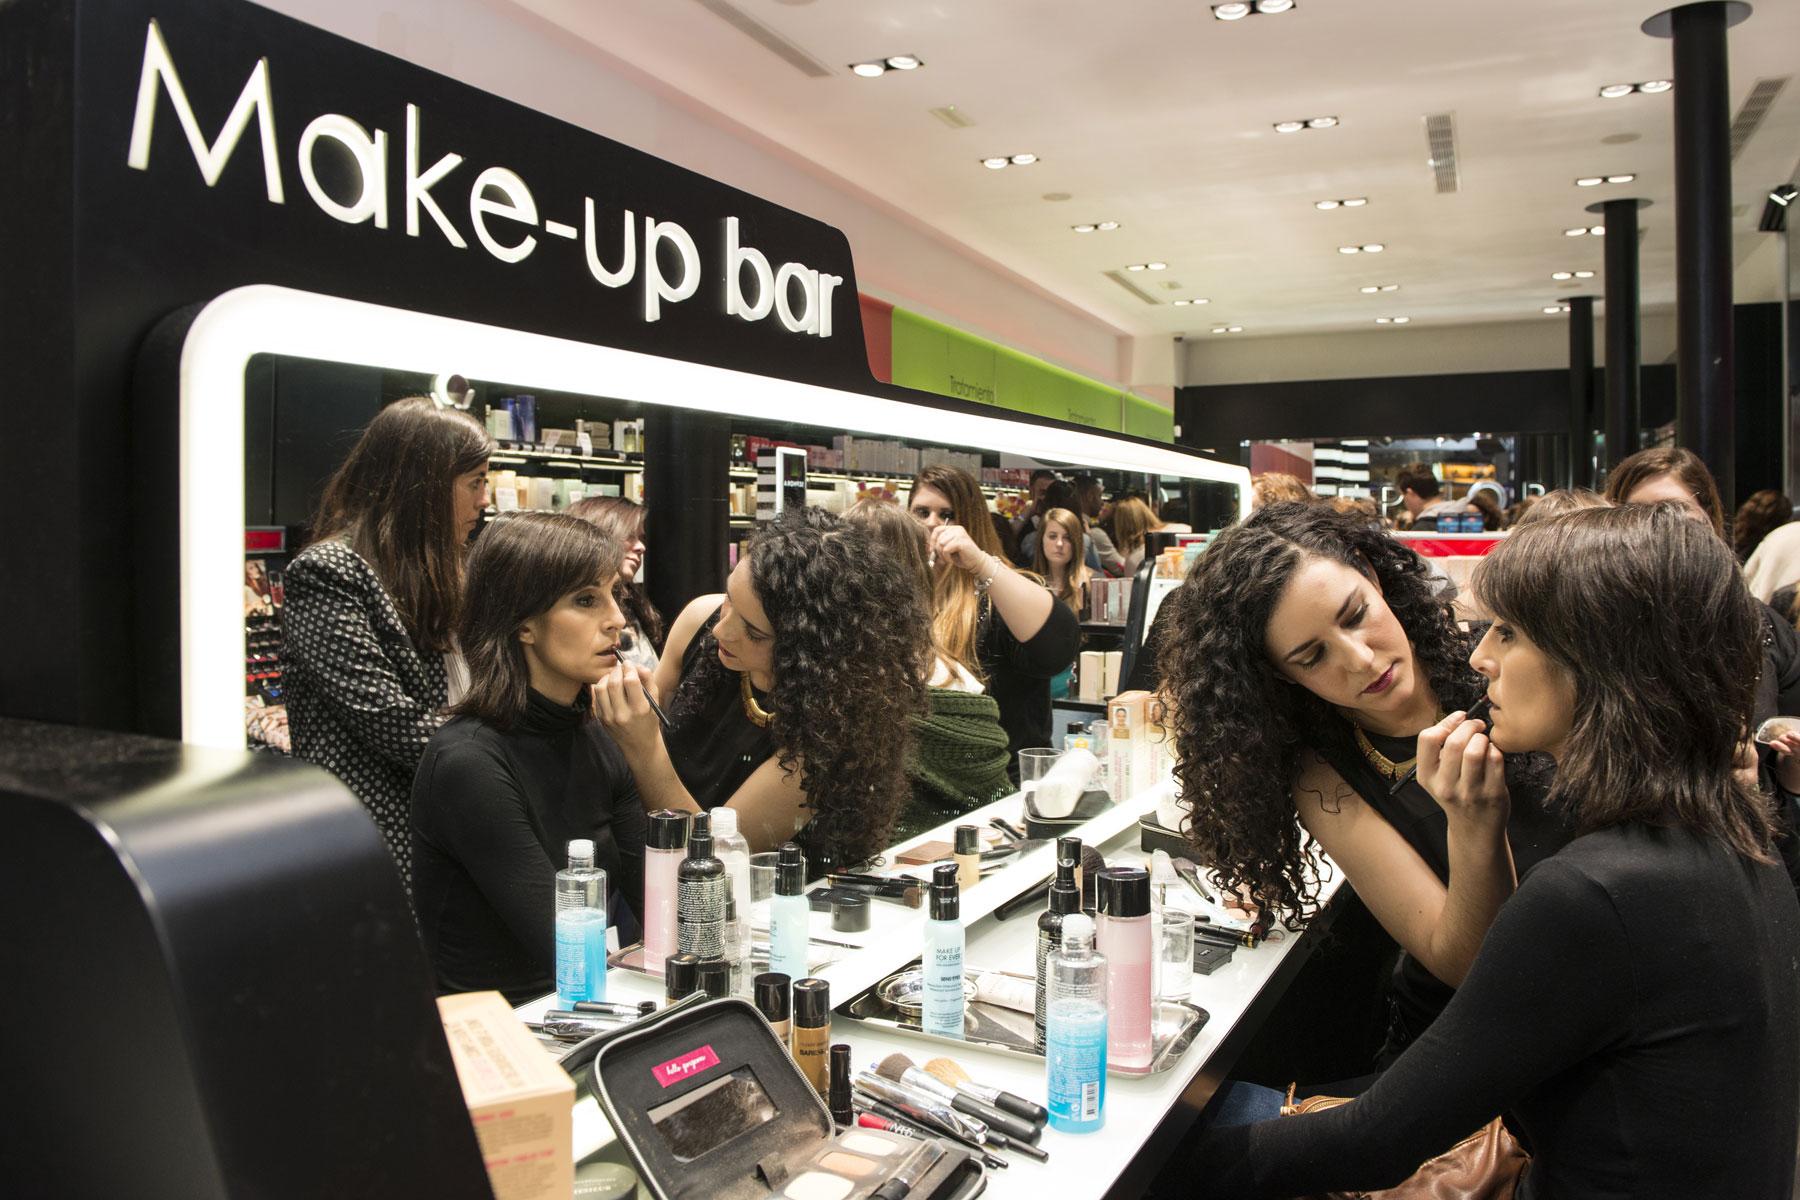 Make-up bar en la fiesta inaugural de Sephora en la calle Tetuán (Sevilla).